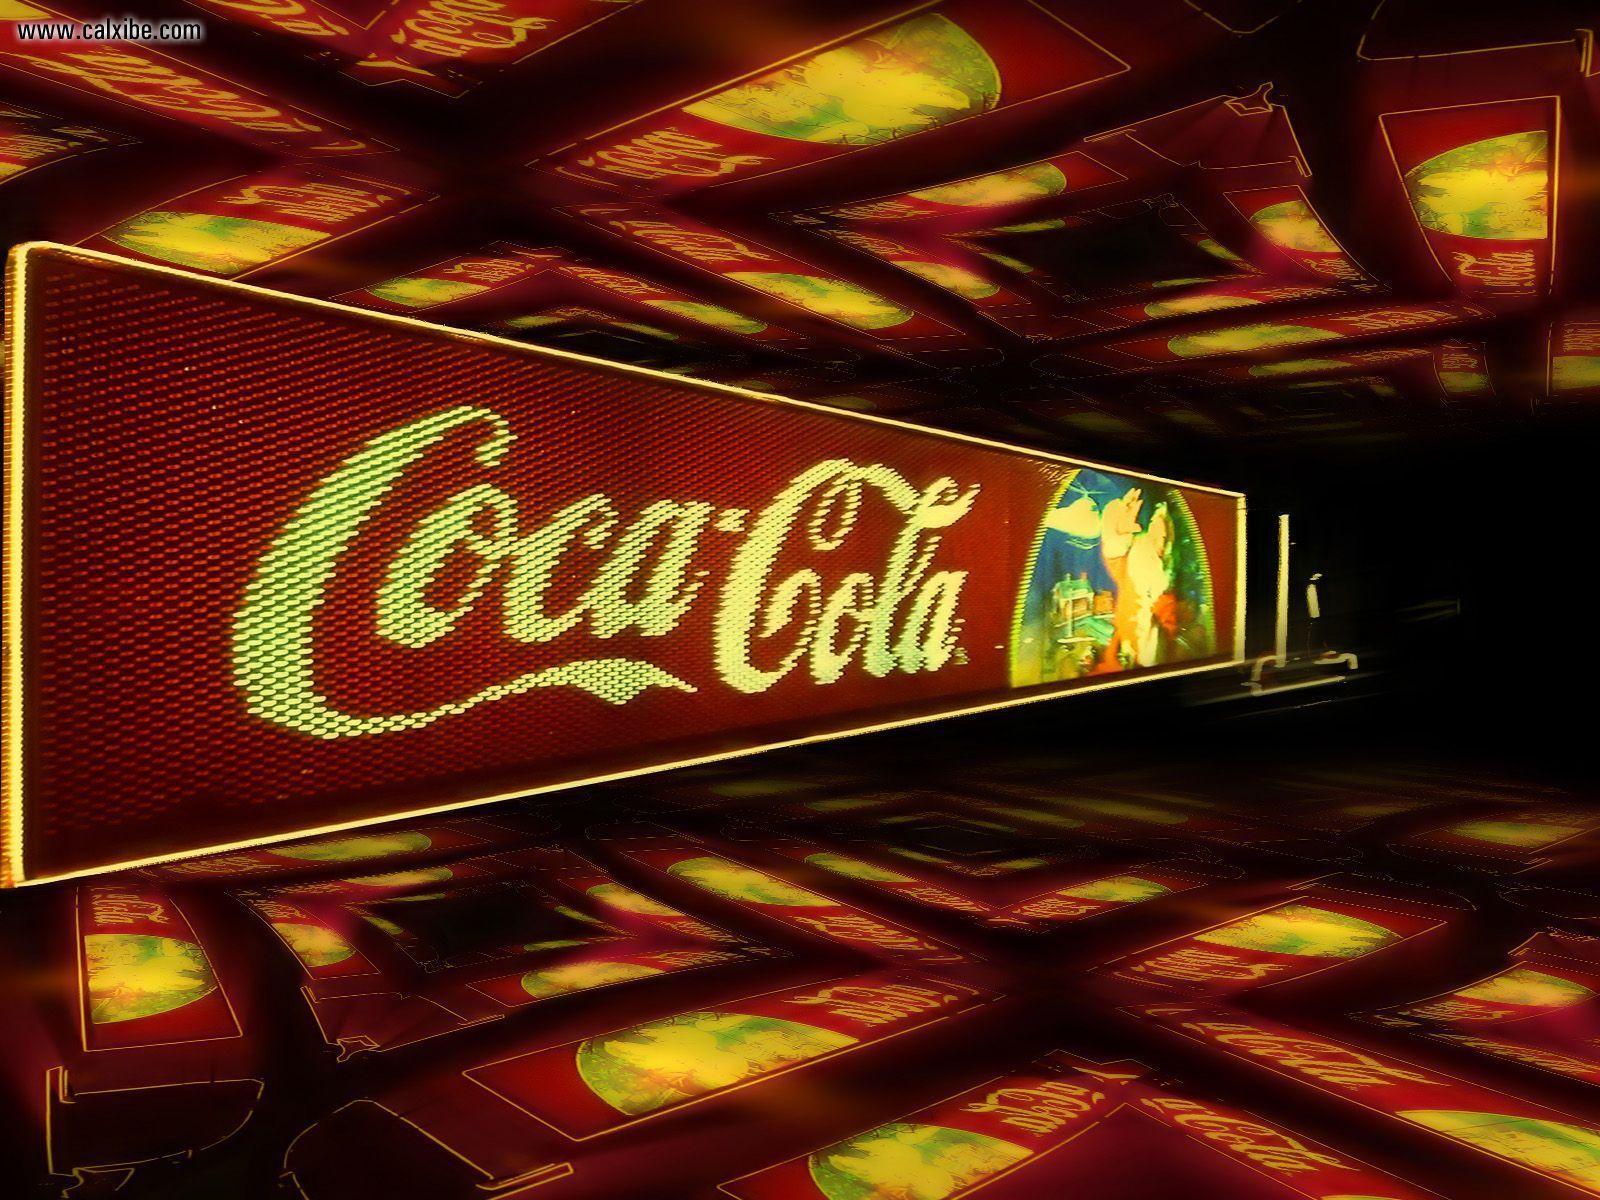 Coca-Cola Christmas Wallpaper | View Coca Cola - Christmas Truck in ...